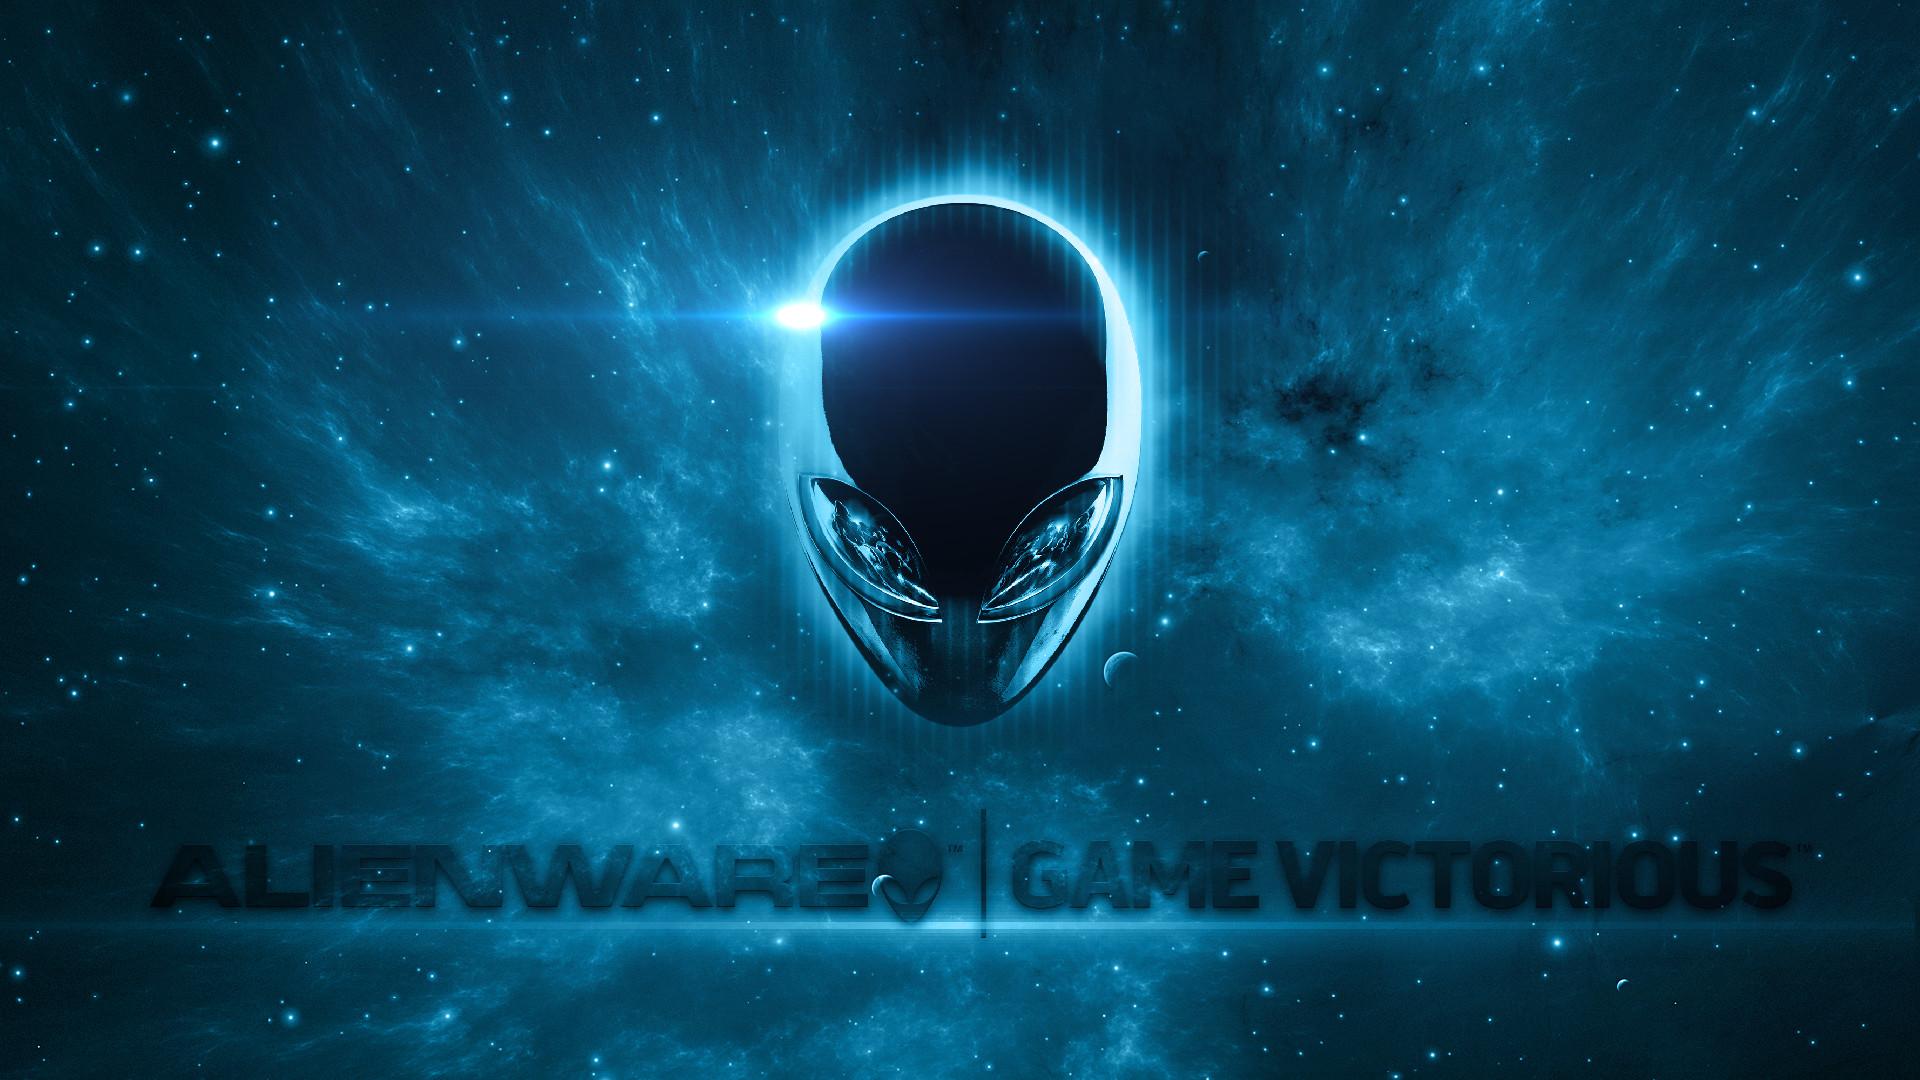 Etwas Neues genug 4K Alienware Wallpaper (72+ images) #PH_88